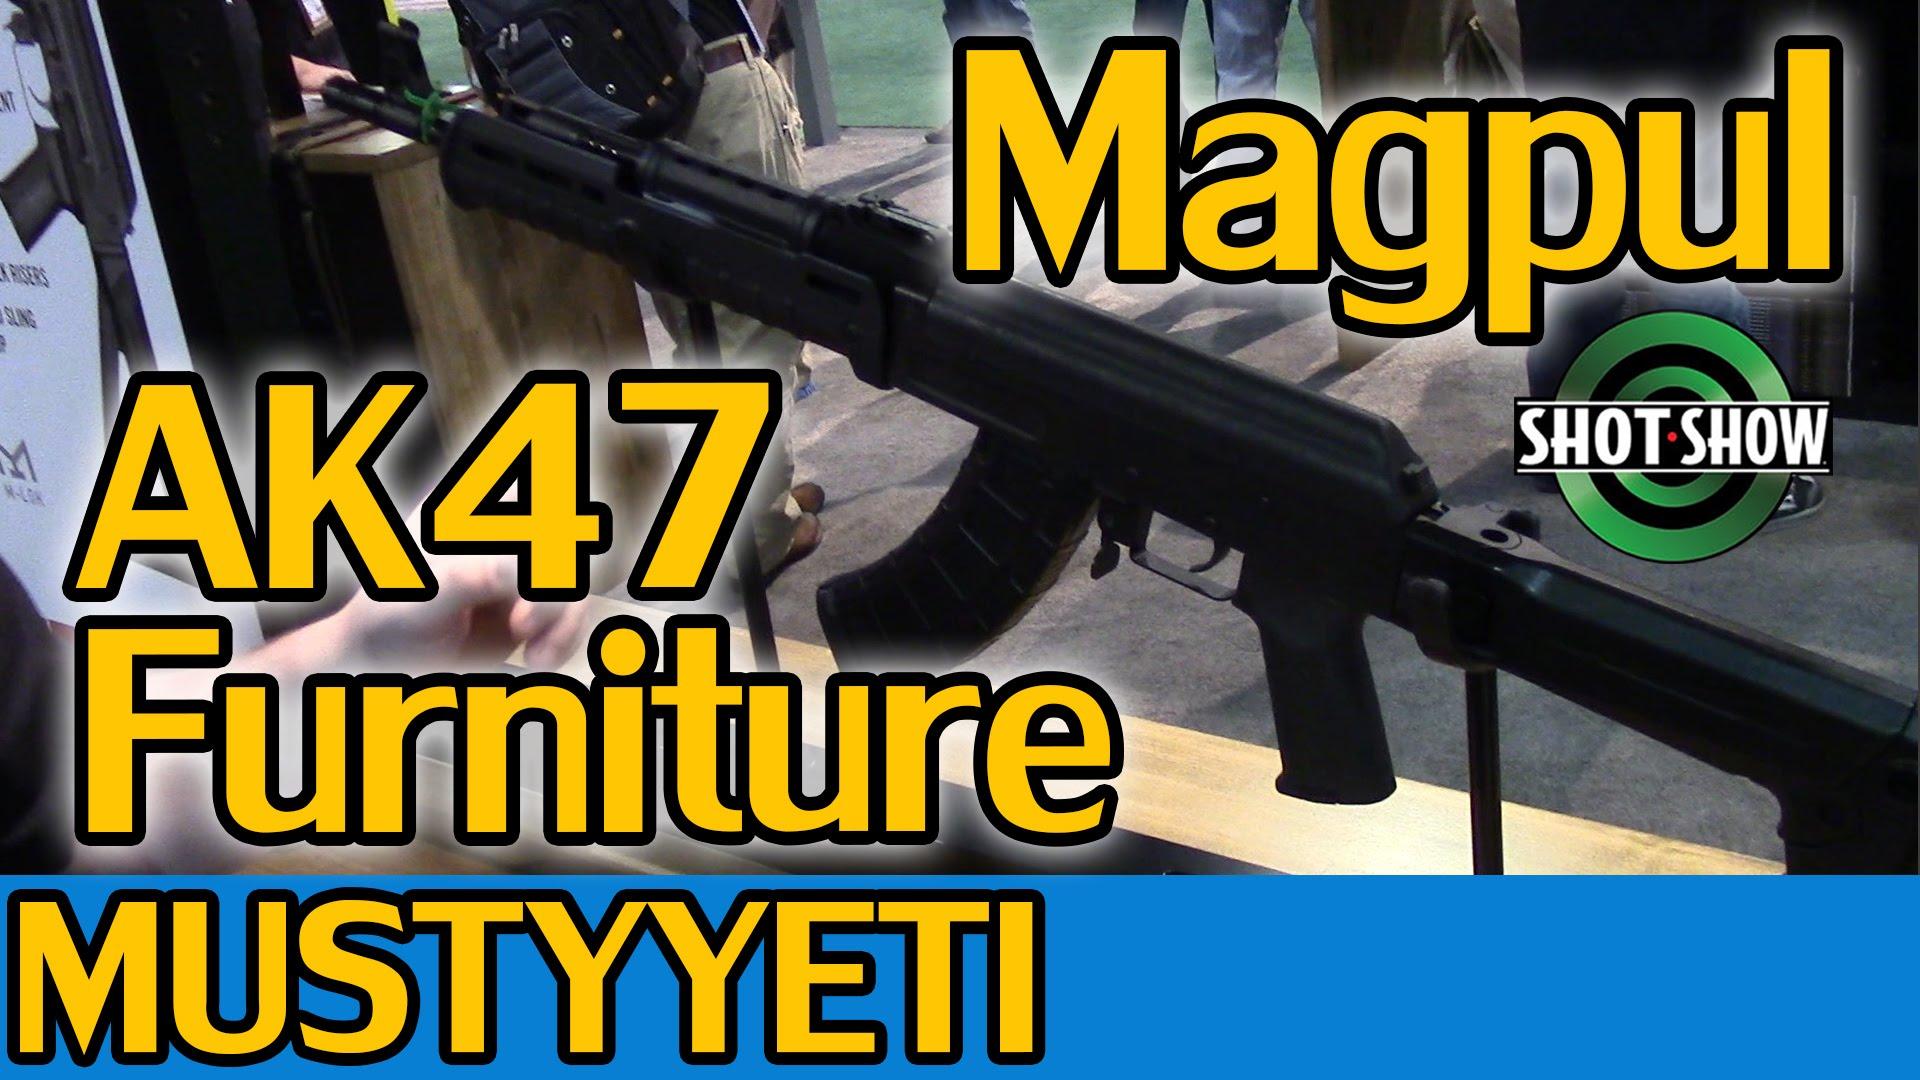 Magpul AK Furniture | Shot Show 2015 | Musty Yeti